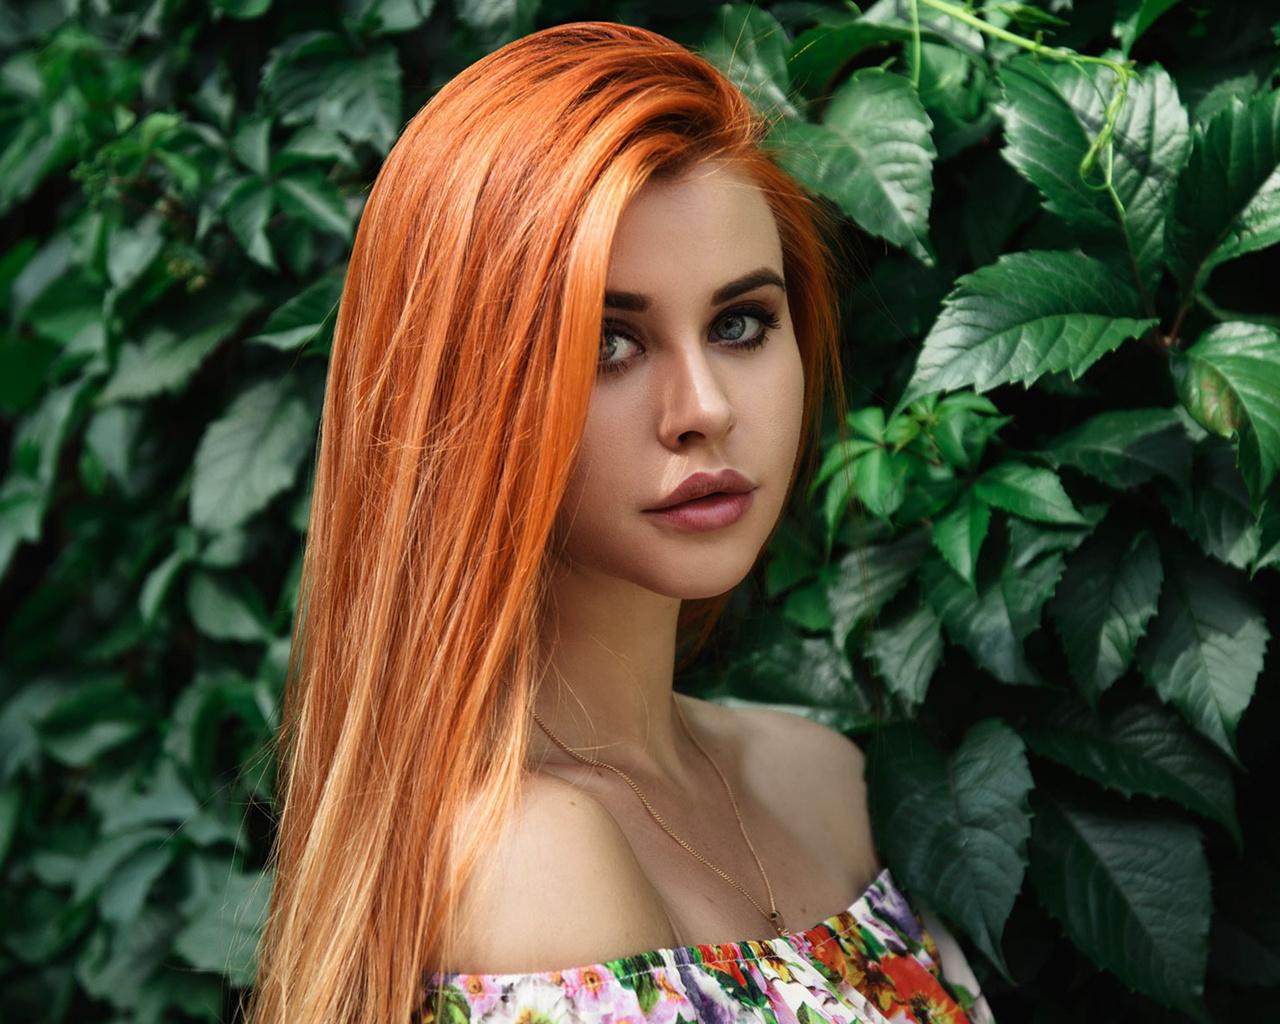 dana bounty, women, redhead, portrait, dress, bare shoulders, women outdoors, long hair, https://www.nastol.com.ua/peoples/299818-devushka-ryzhaya-model-vzglyad-dana-bounty.html, анастасия шеина ,anastasiya sheina